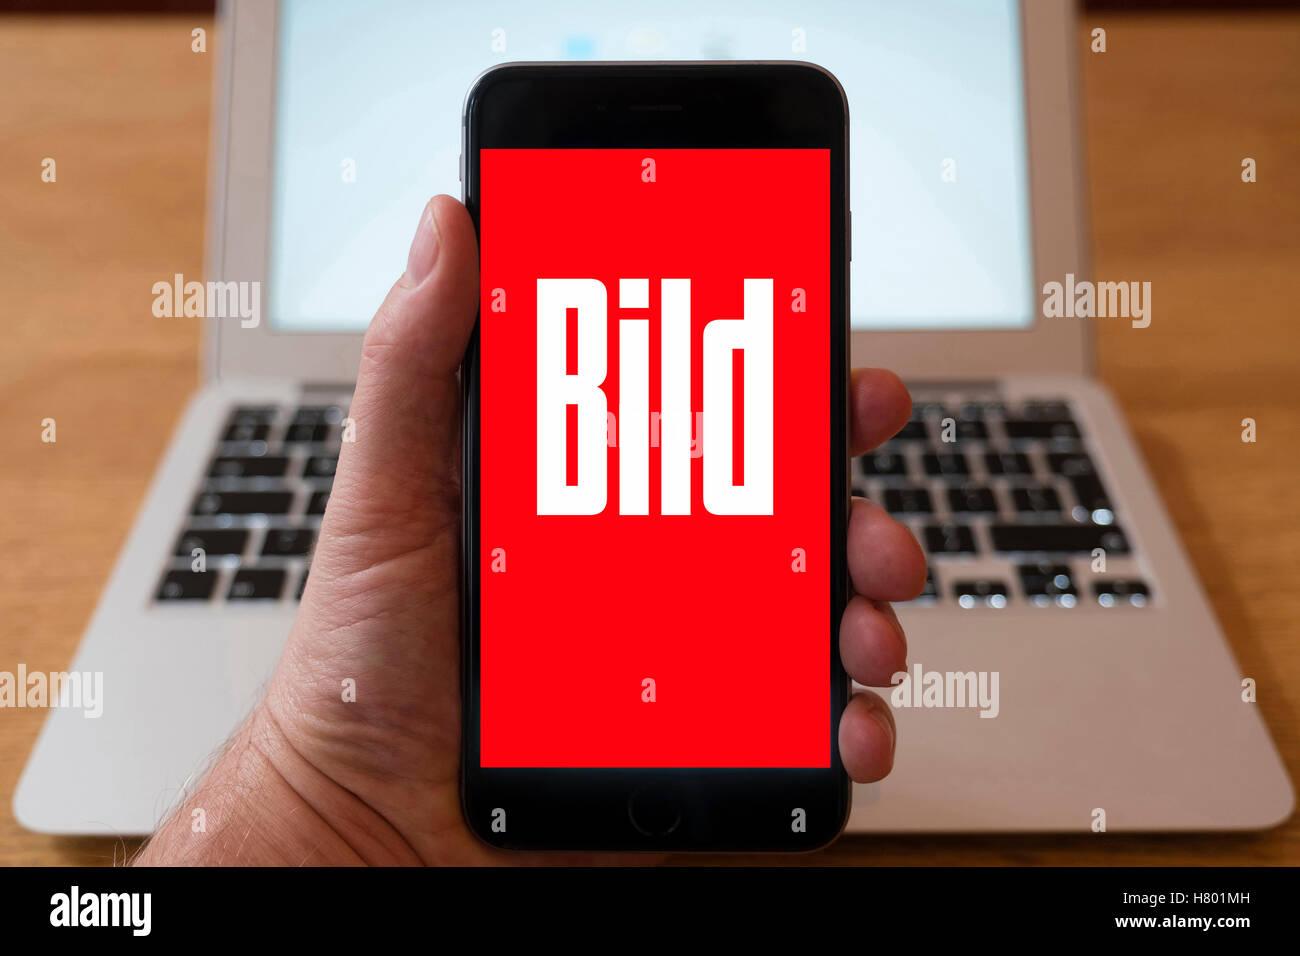 Using iPhone smartphone to display logo of Bild German tabloid magazine - Stock Image